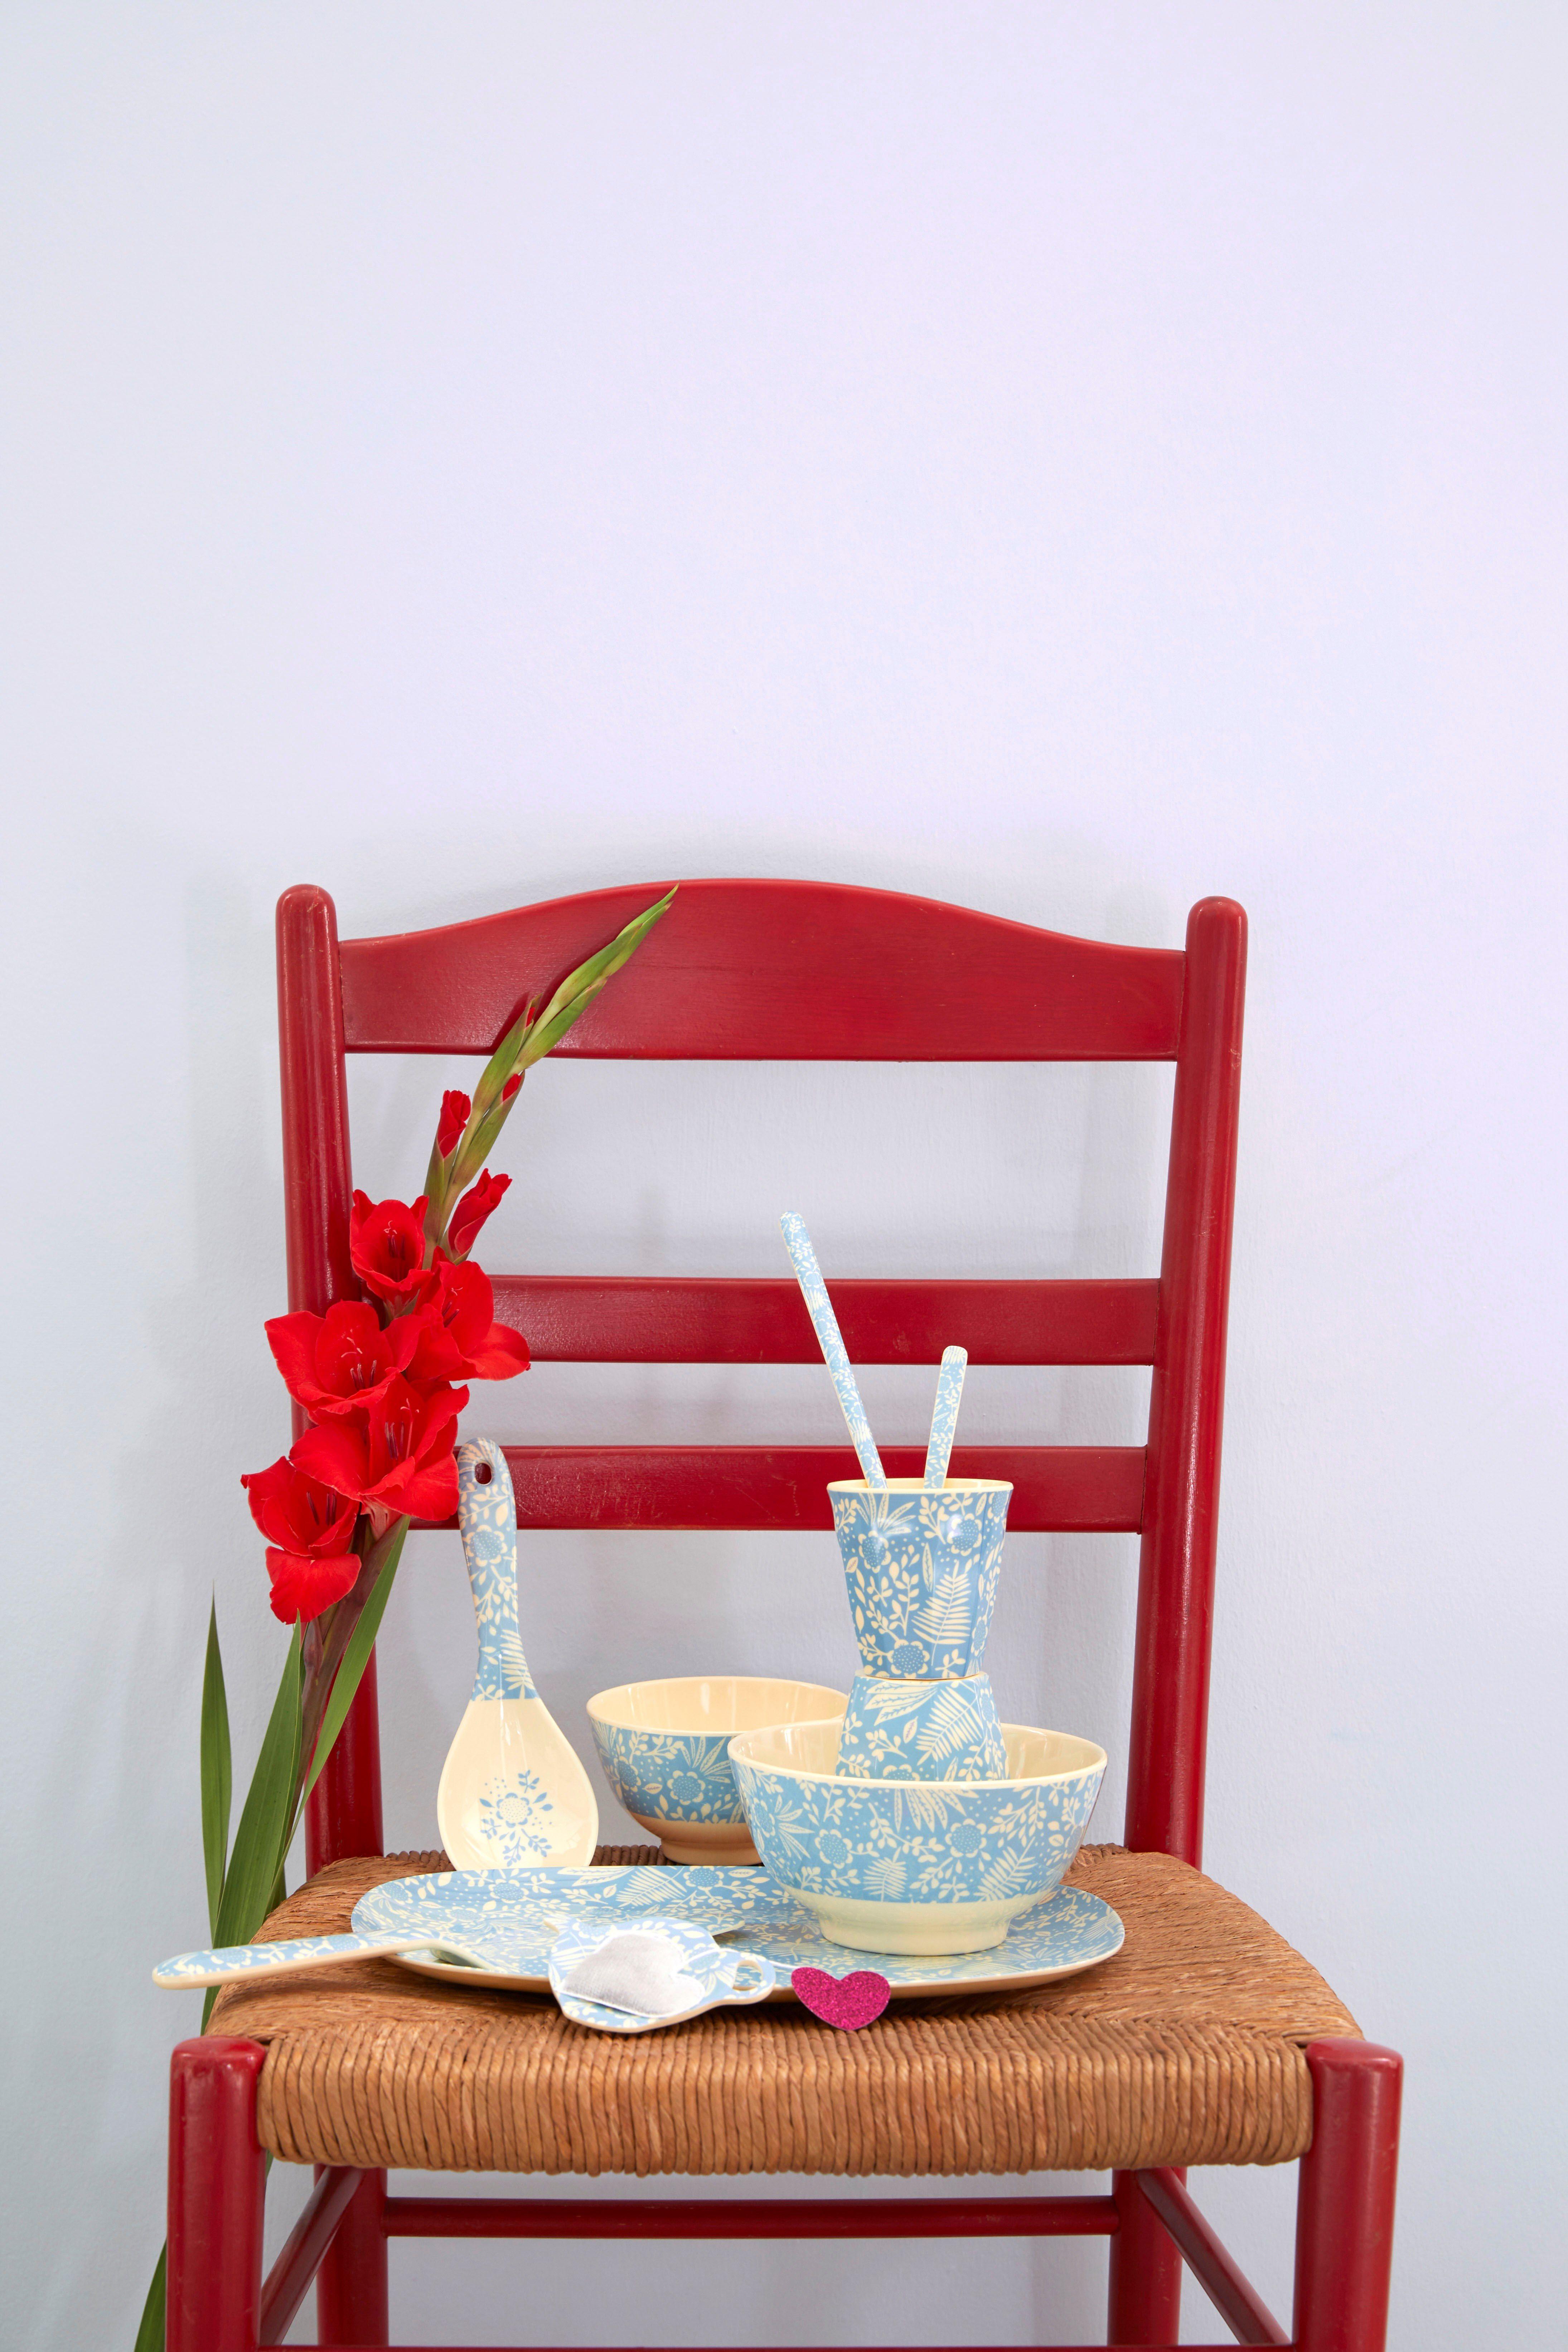 Medium Melamine Cup - Cloud Print - rice